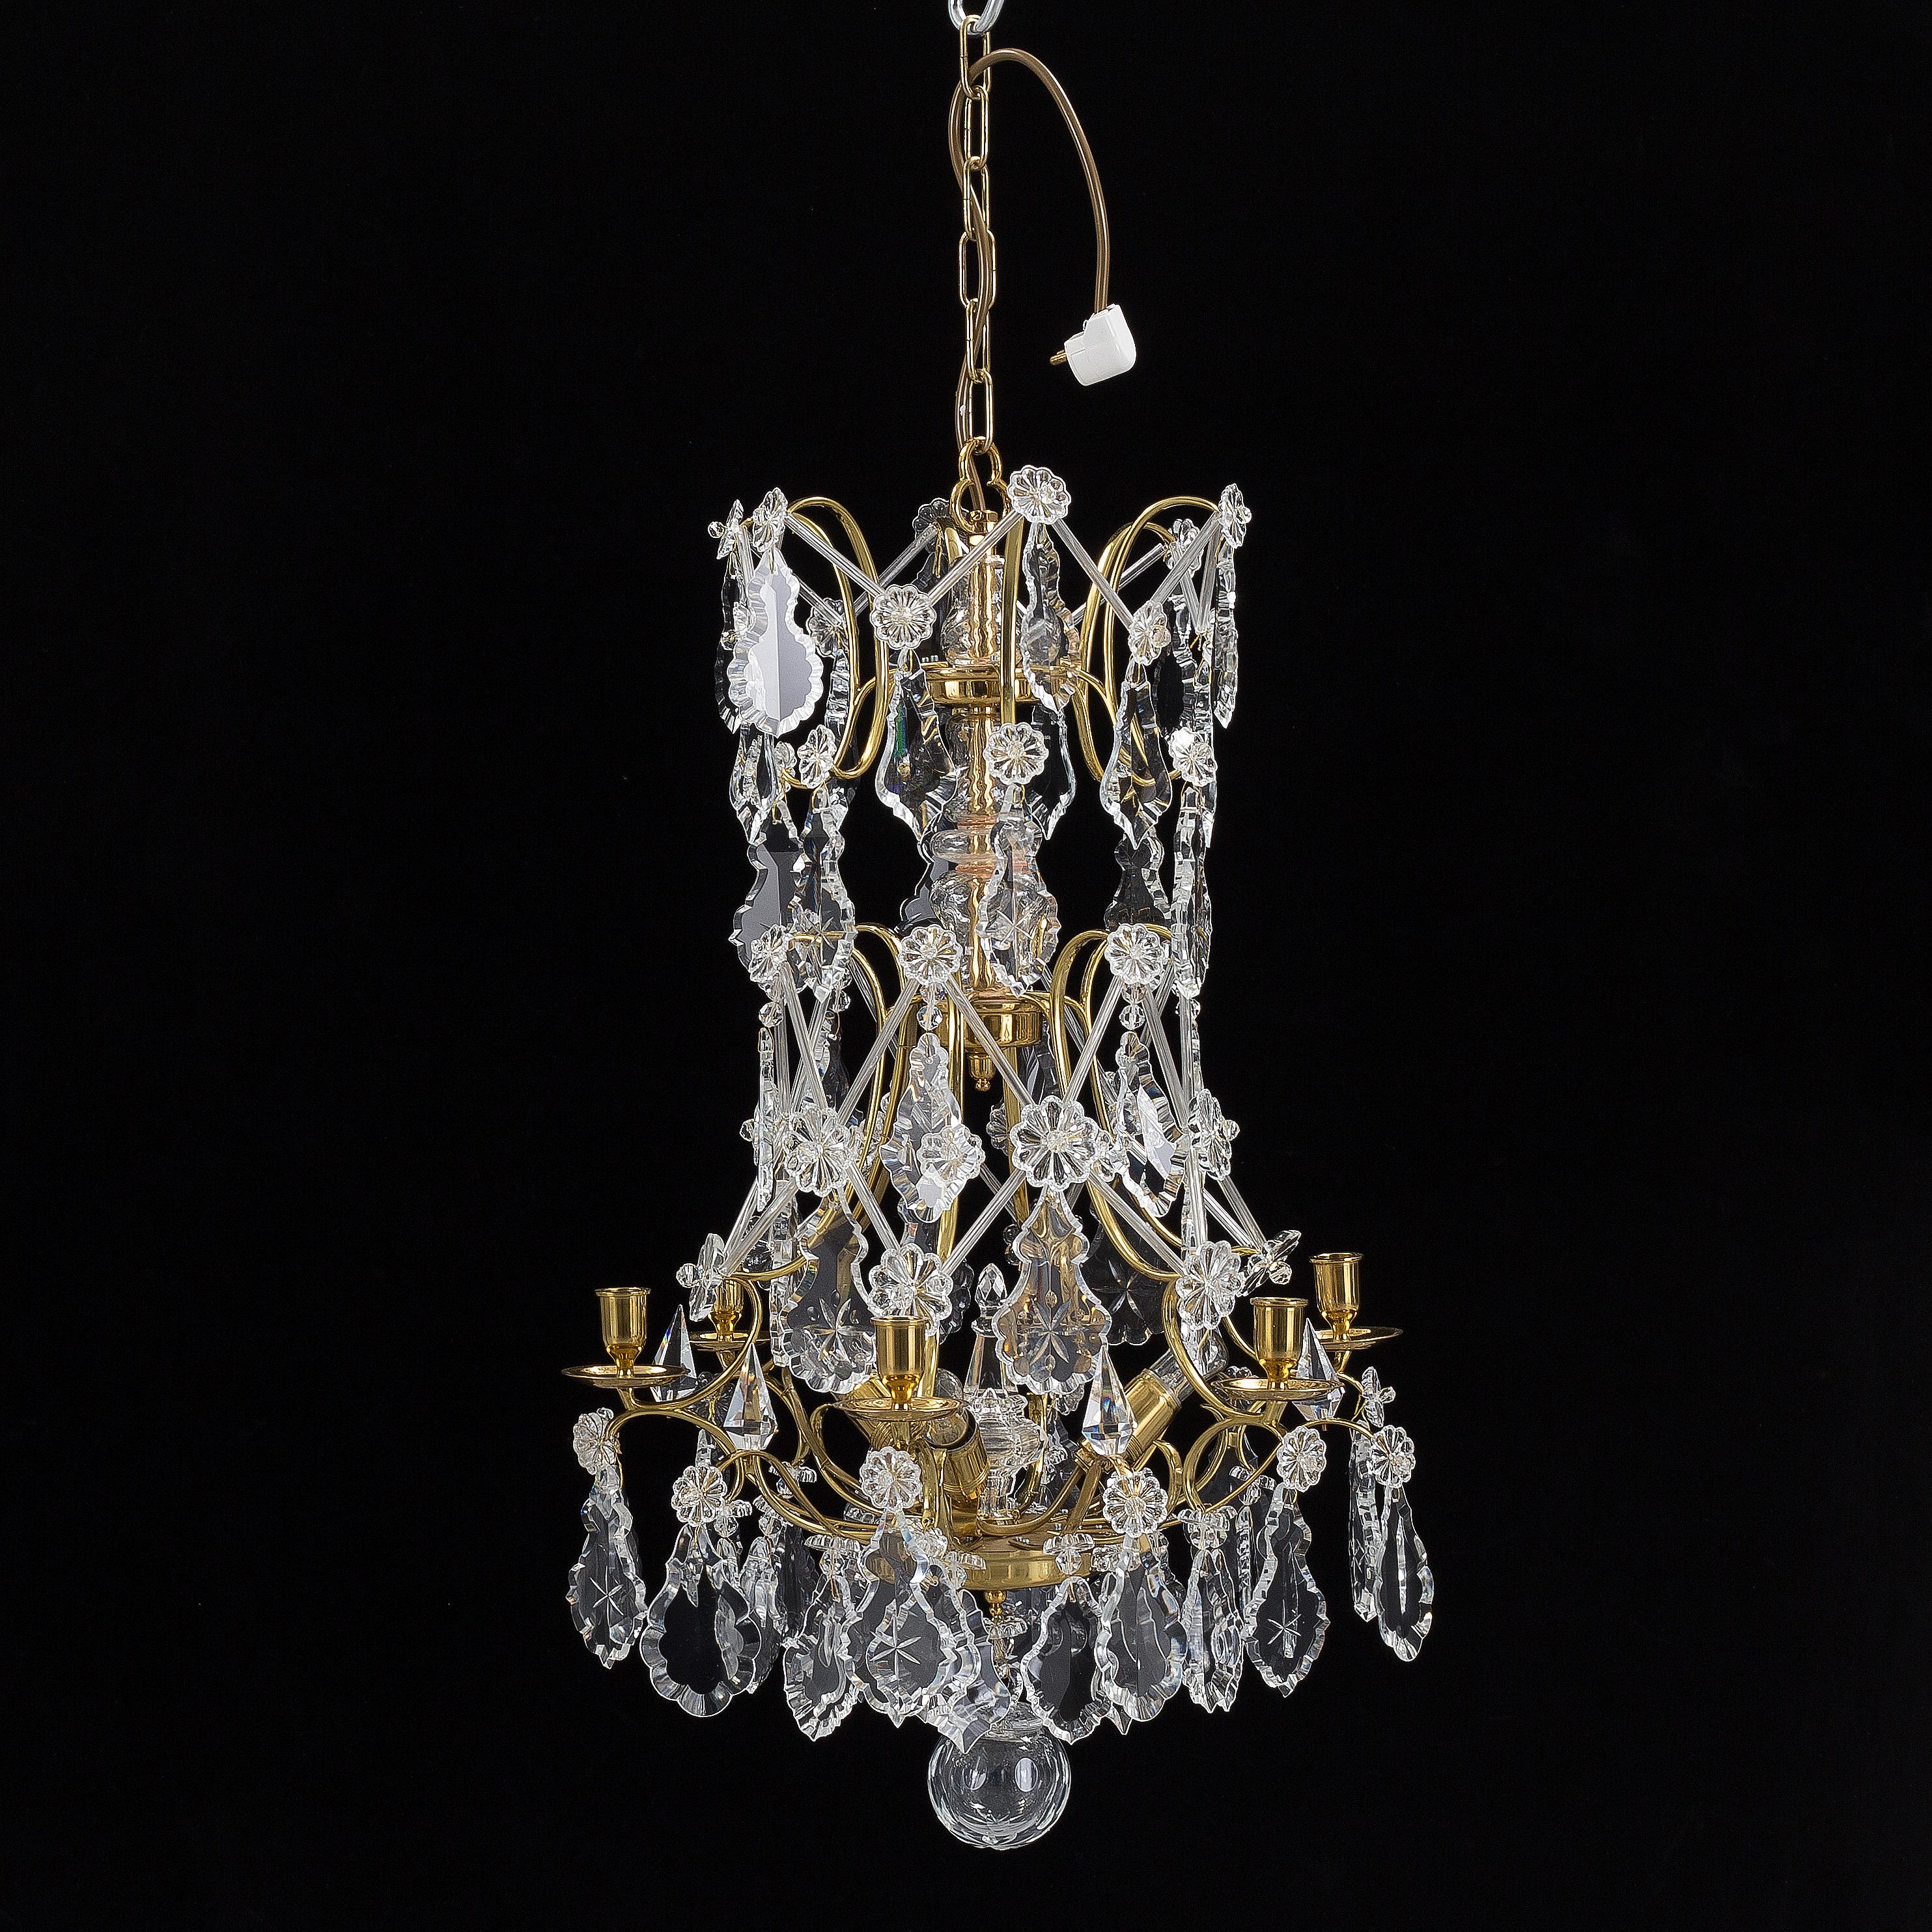 A chandelier rococo style KA Jonsson metallfabrik 20th 21th